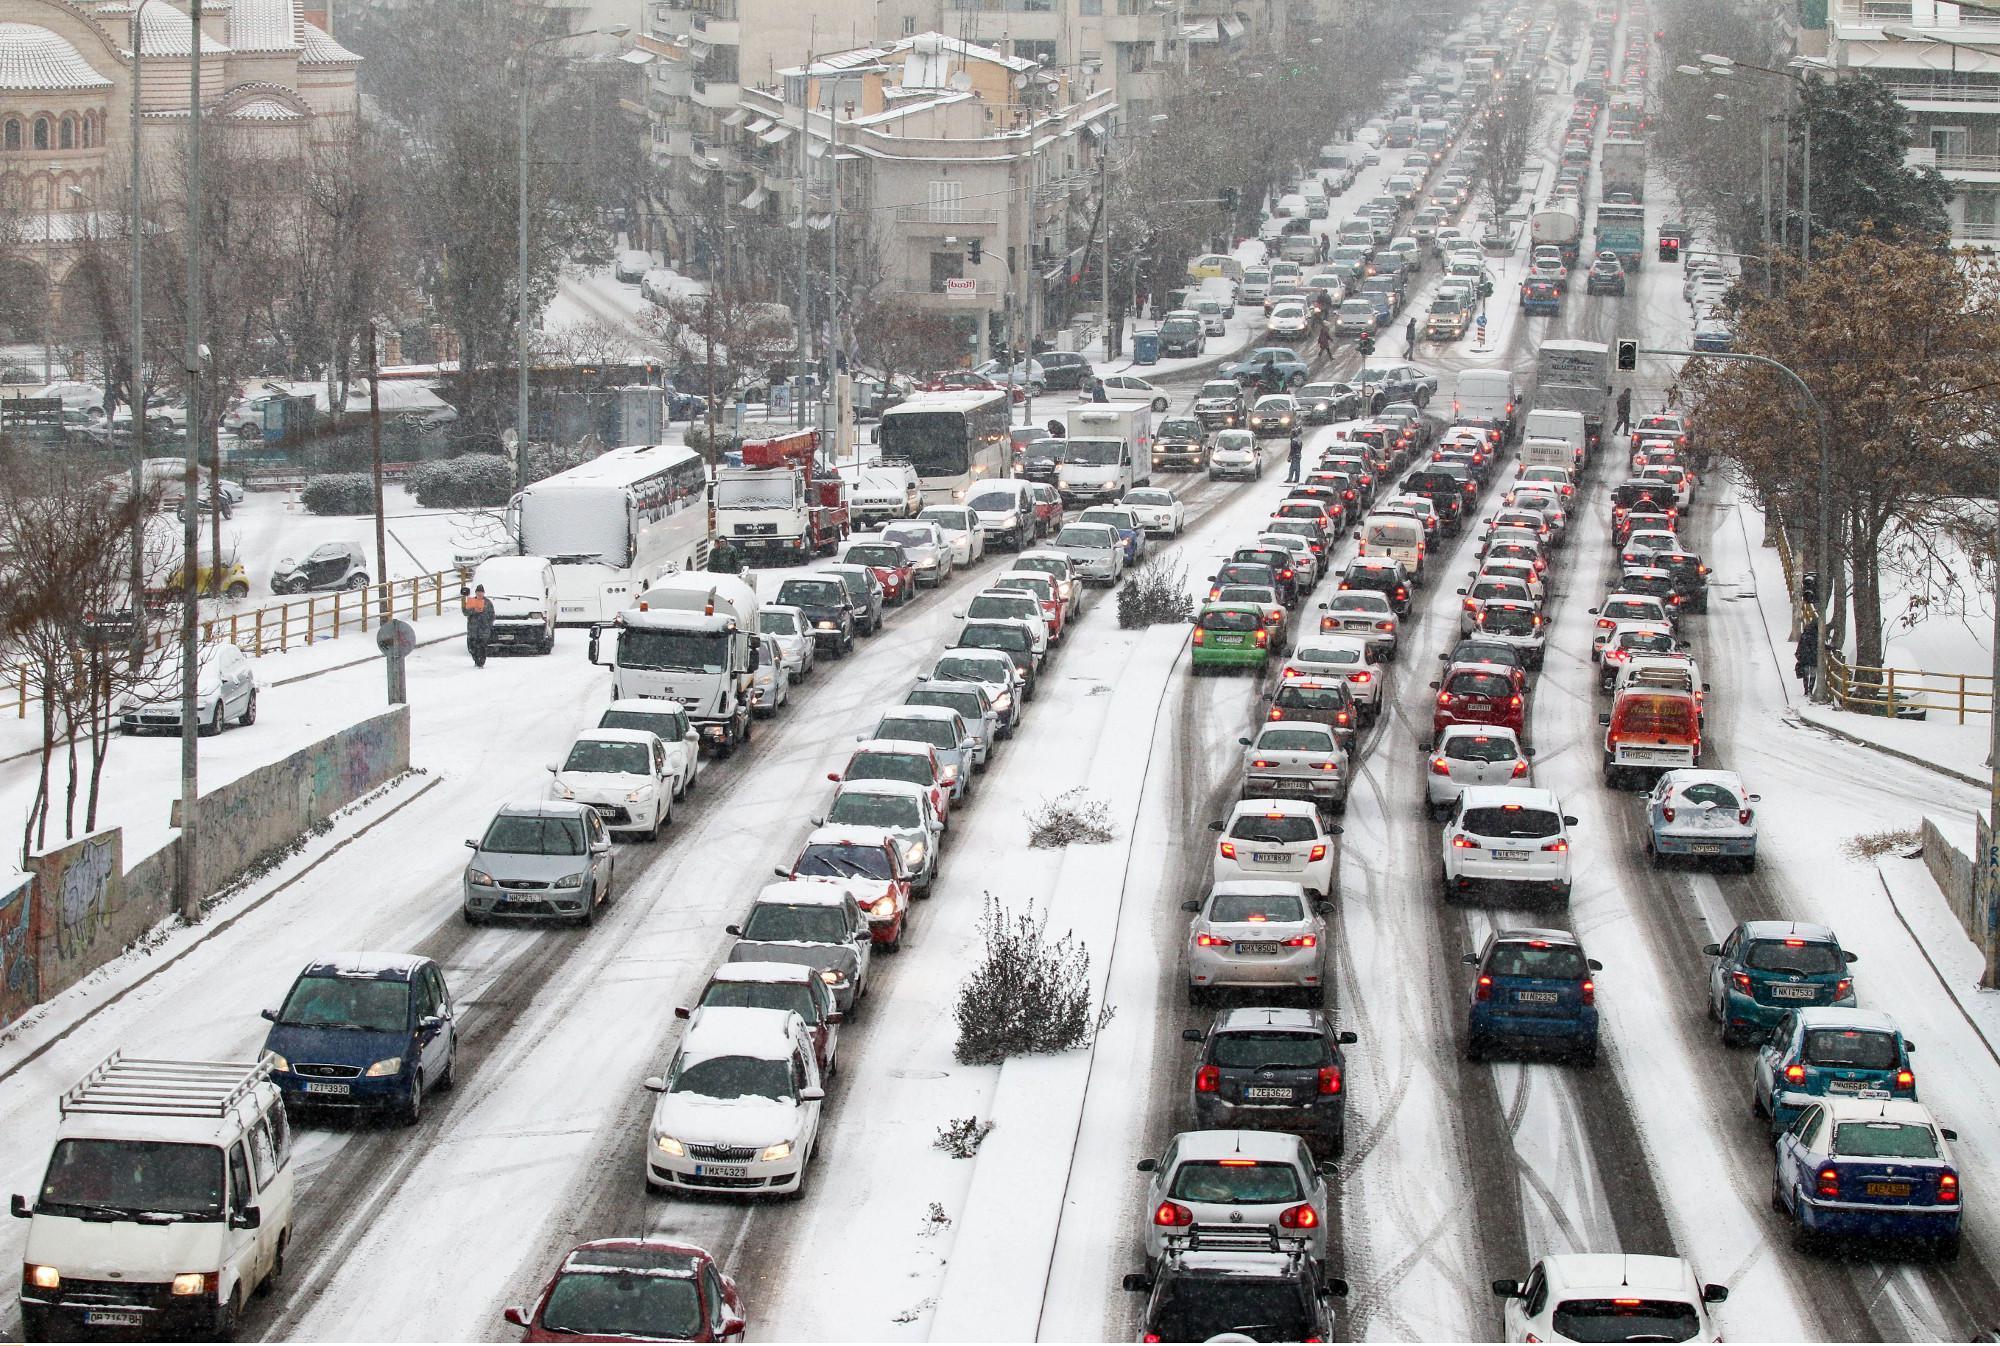 thessaloniki-botiliarisma-1300-1 Ατελείωτες ώρες στο μποτιλιάρισμα για τους οδηγούς στη Θεσσαλονίκη [εικόνες]